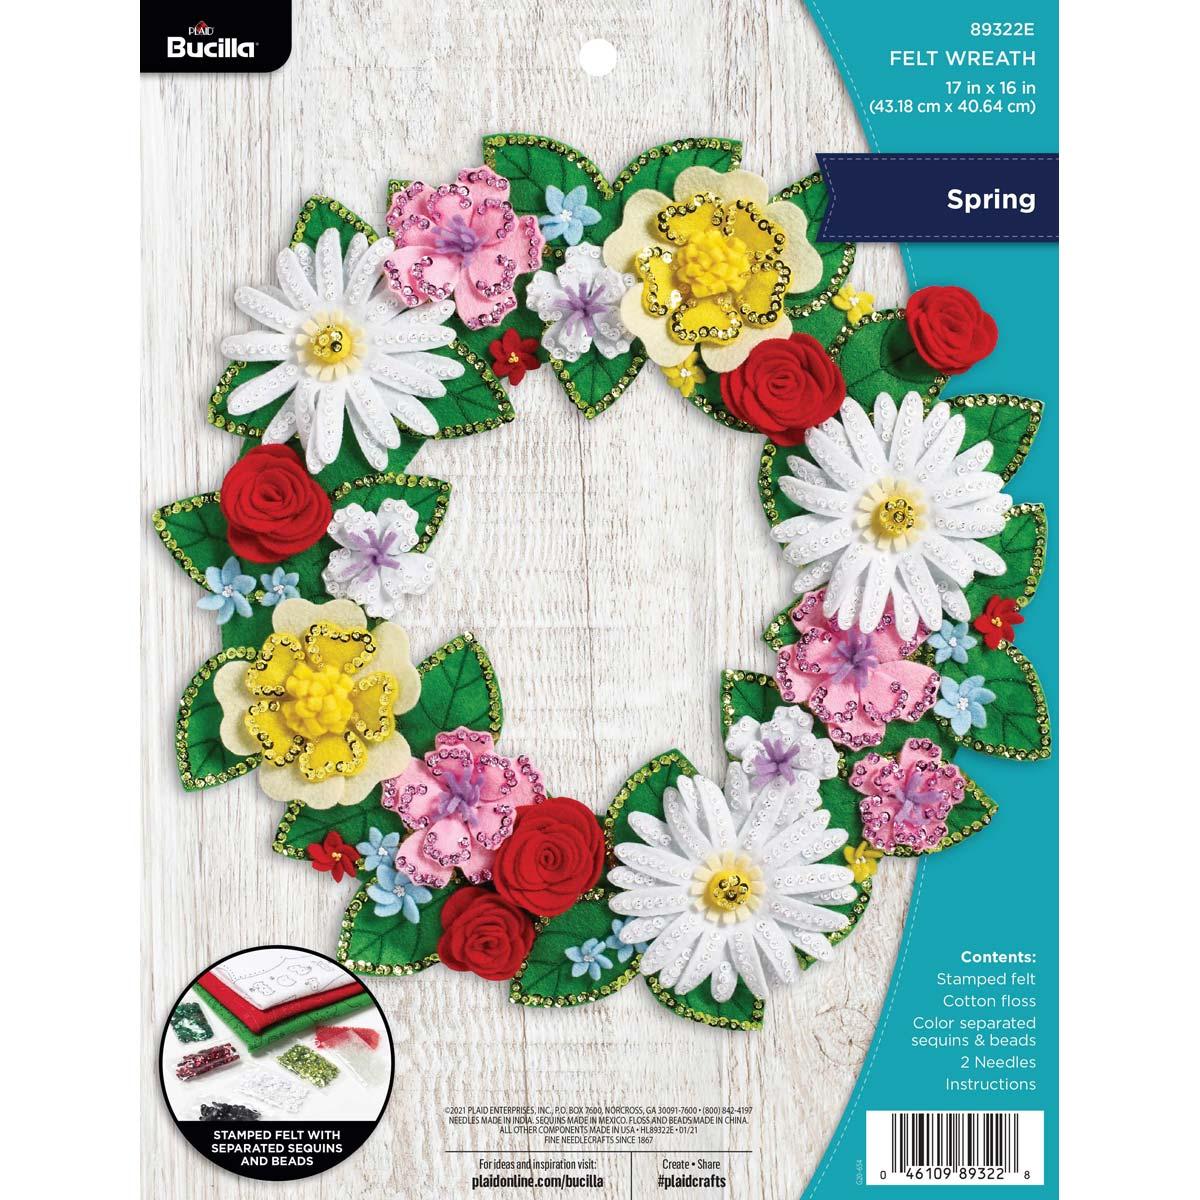 Bucilla ® Seasonal - Felt - Home Decor - Spring Wreath - 89322E